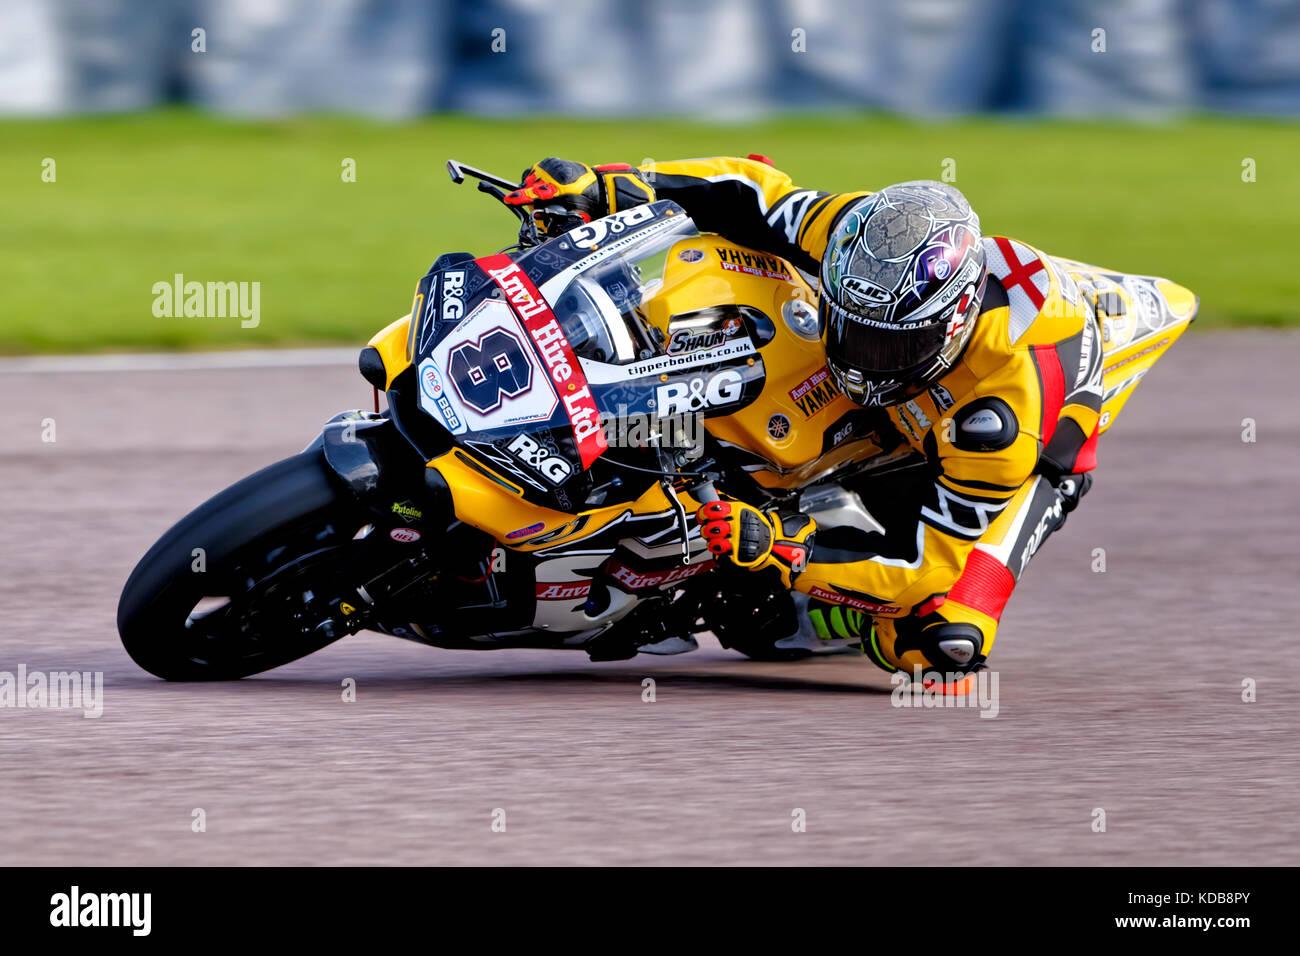 British Superbike Rider Shaun Winfield on the Anvil Hire TAG Racing Yamaha YZF-R1 at the MCE Insurance British Superbikes - Stock Image